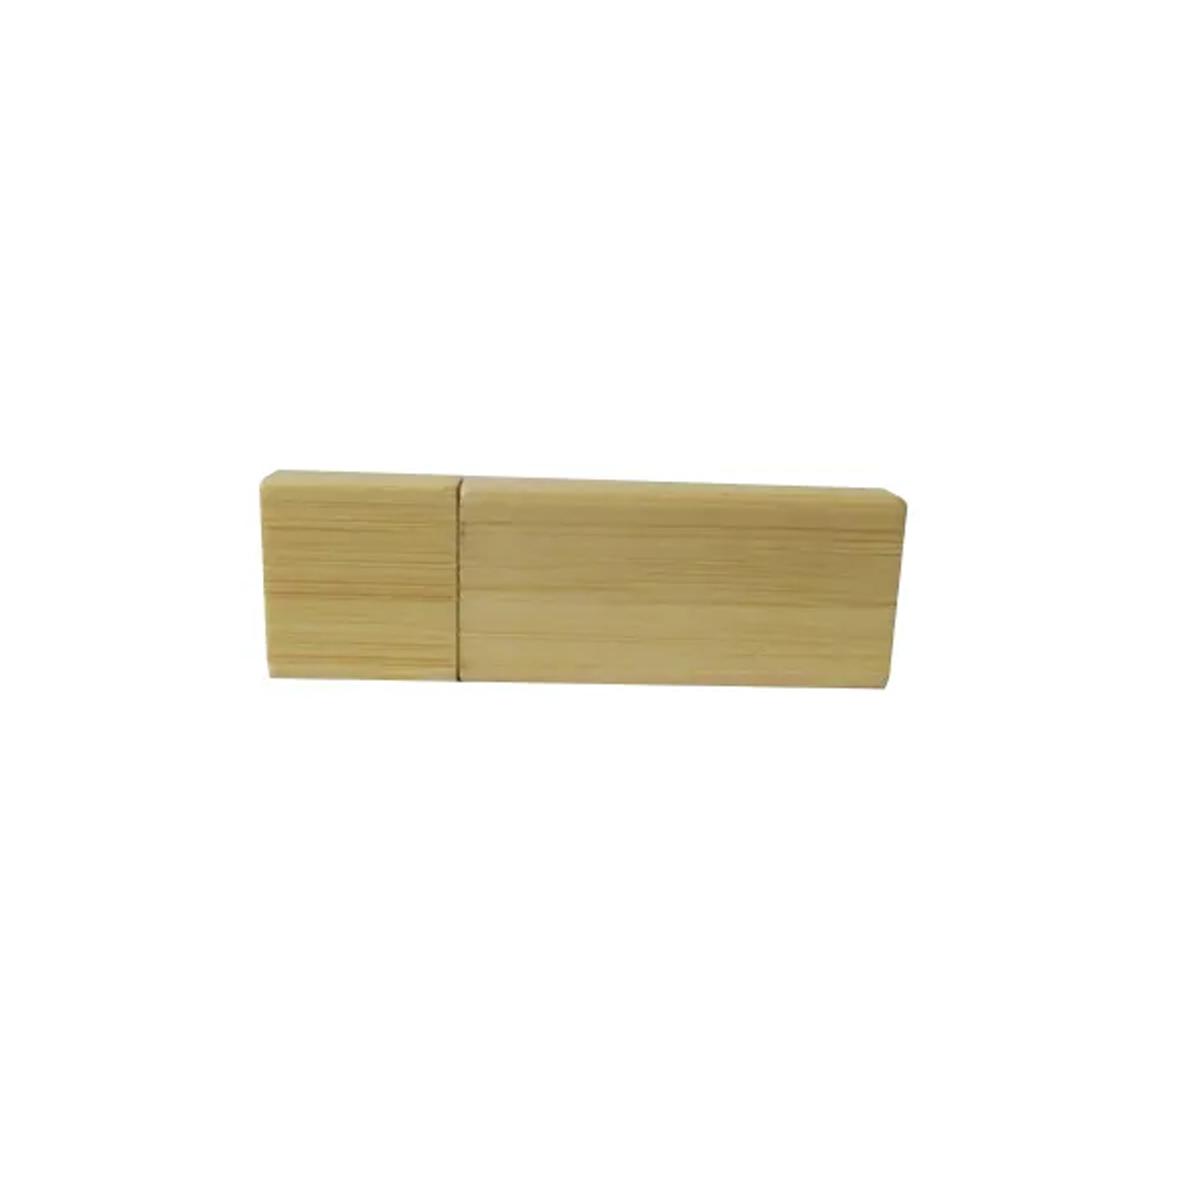 Pendrive de madeira (bambu) MM320 -  8 GB - Pronta Entrega